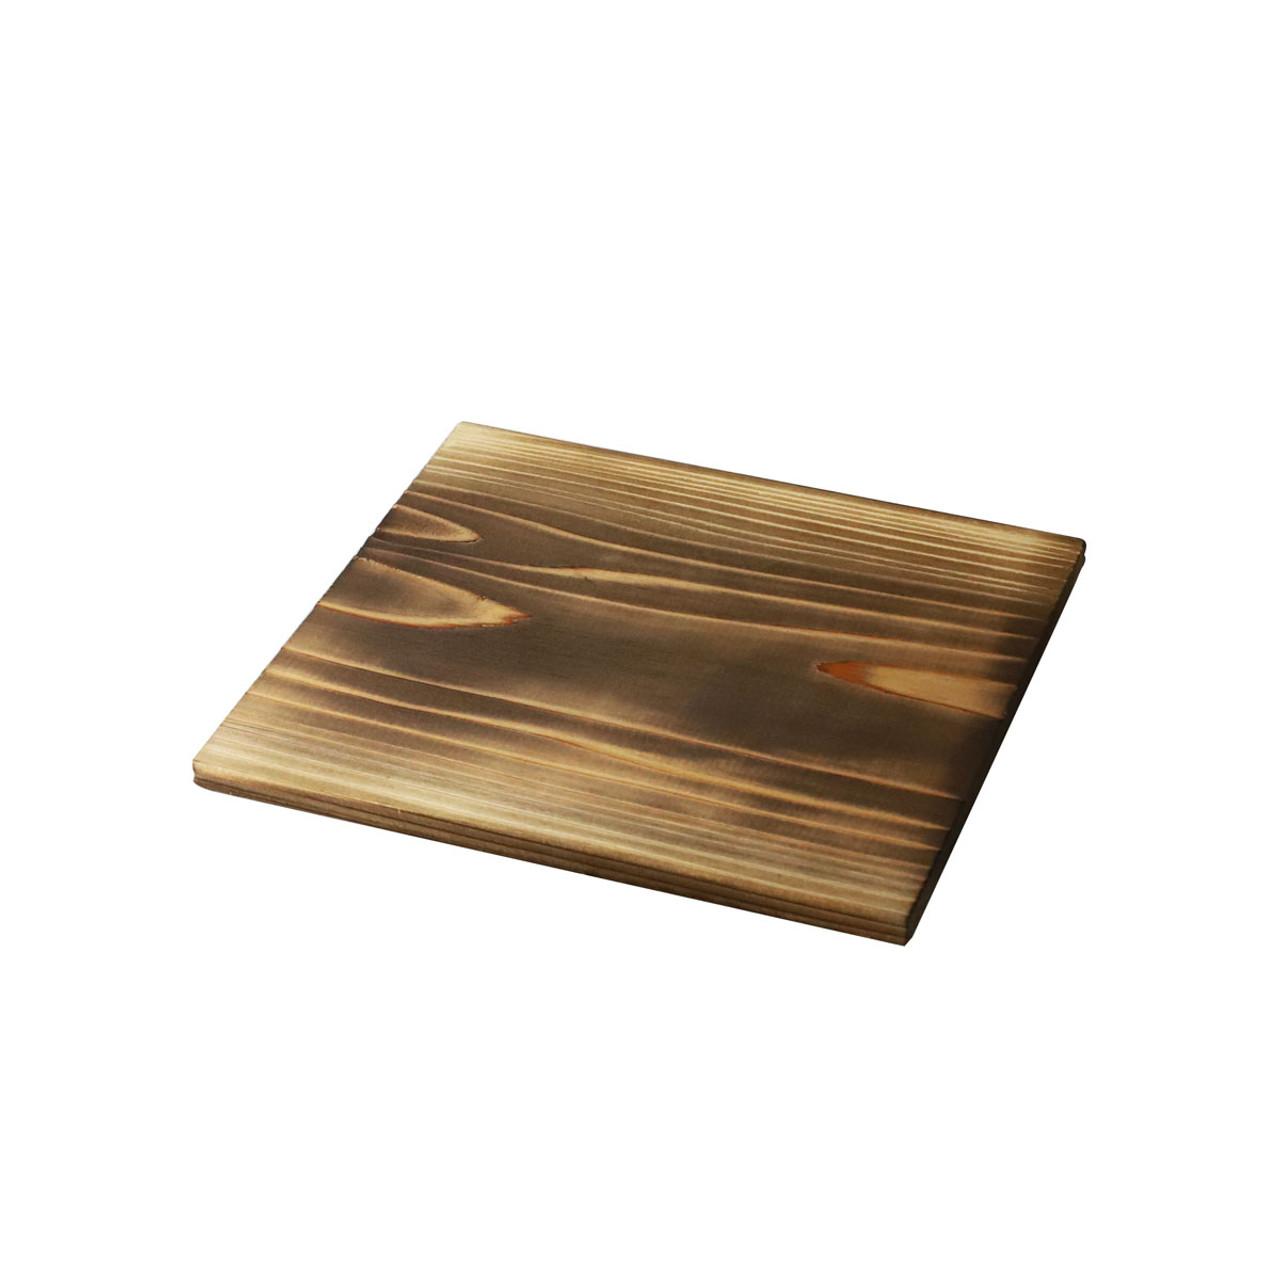 Burnt Cedar Wooden Trivet 7 1 X 7 1 Mtc Kitchen